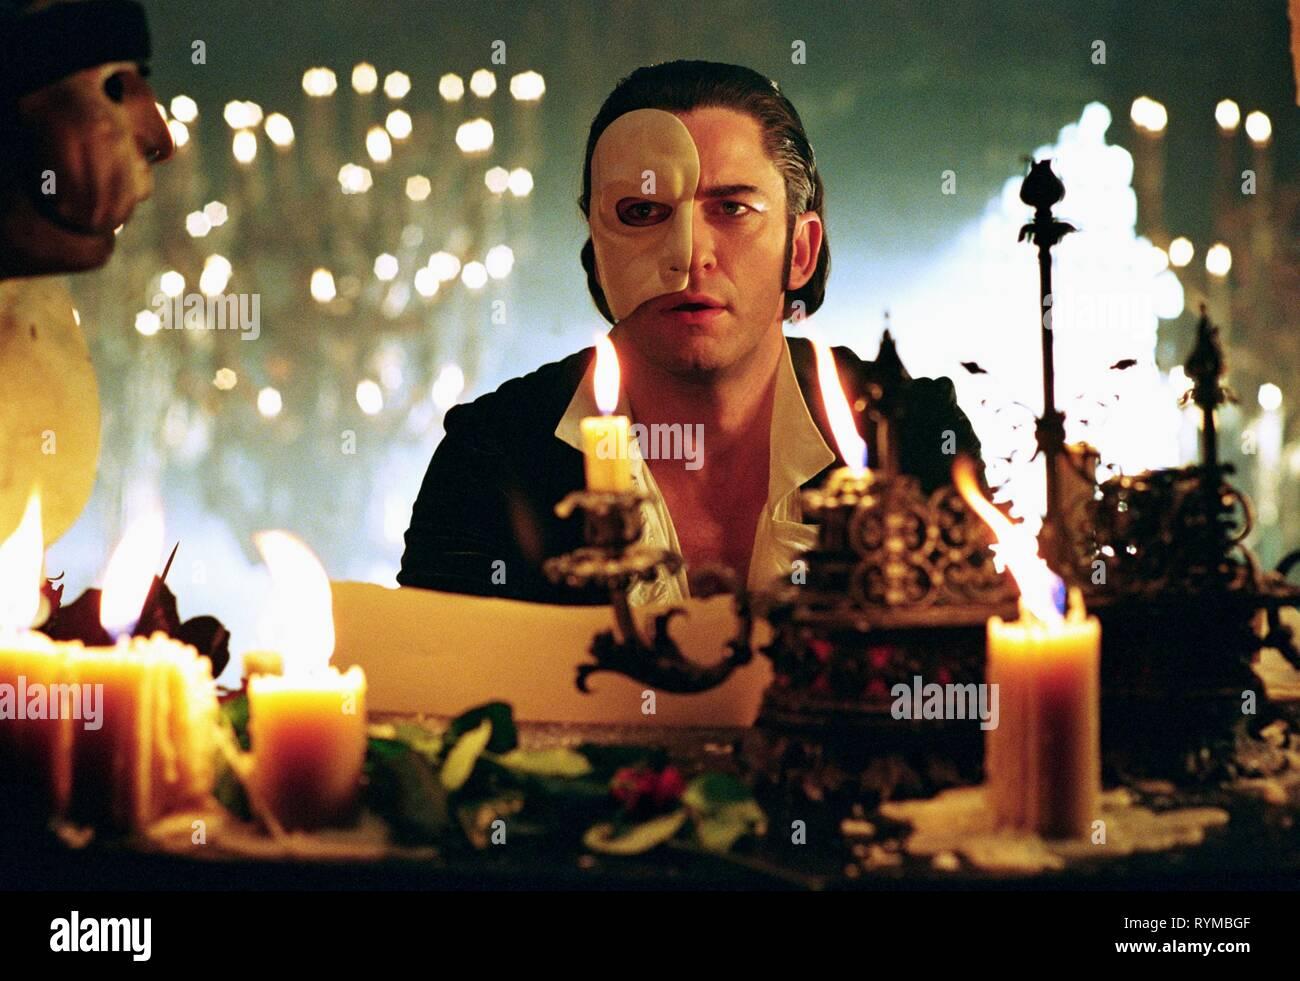 the phantom of the opera movie 2004 download free